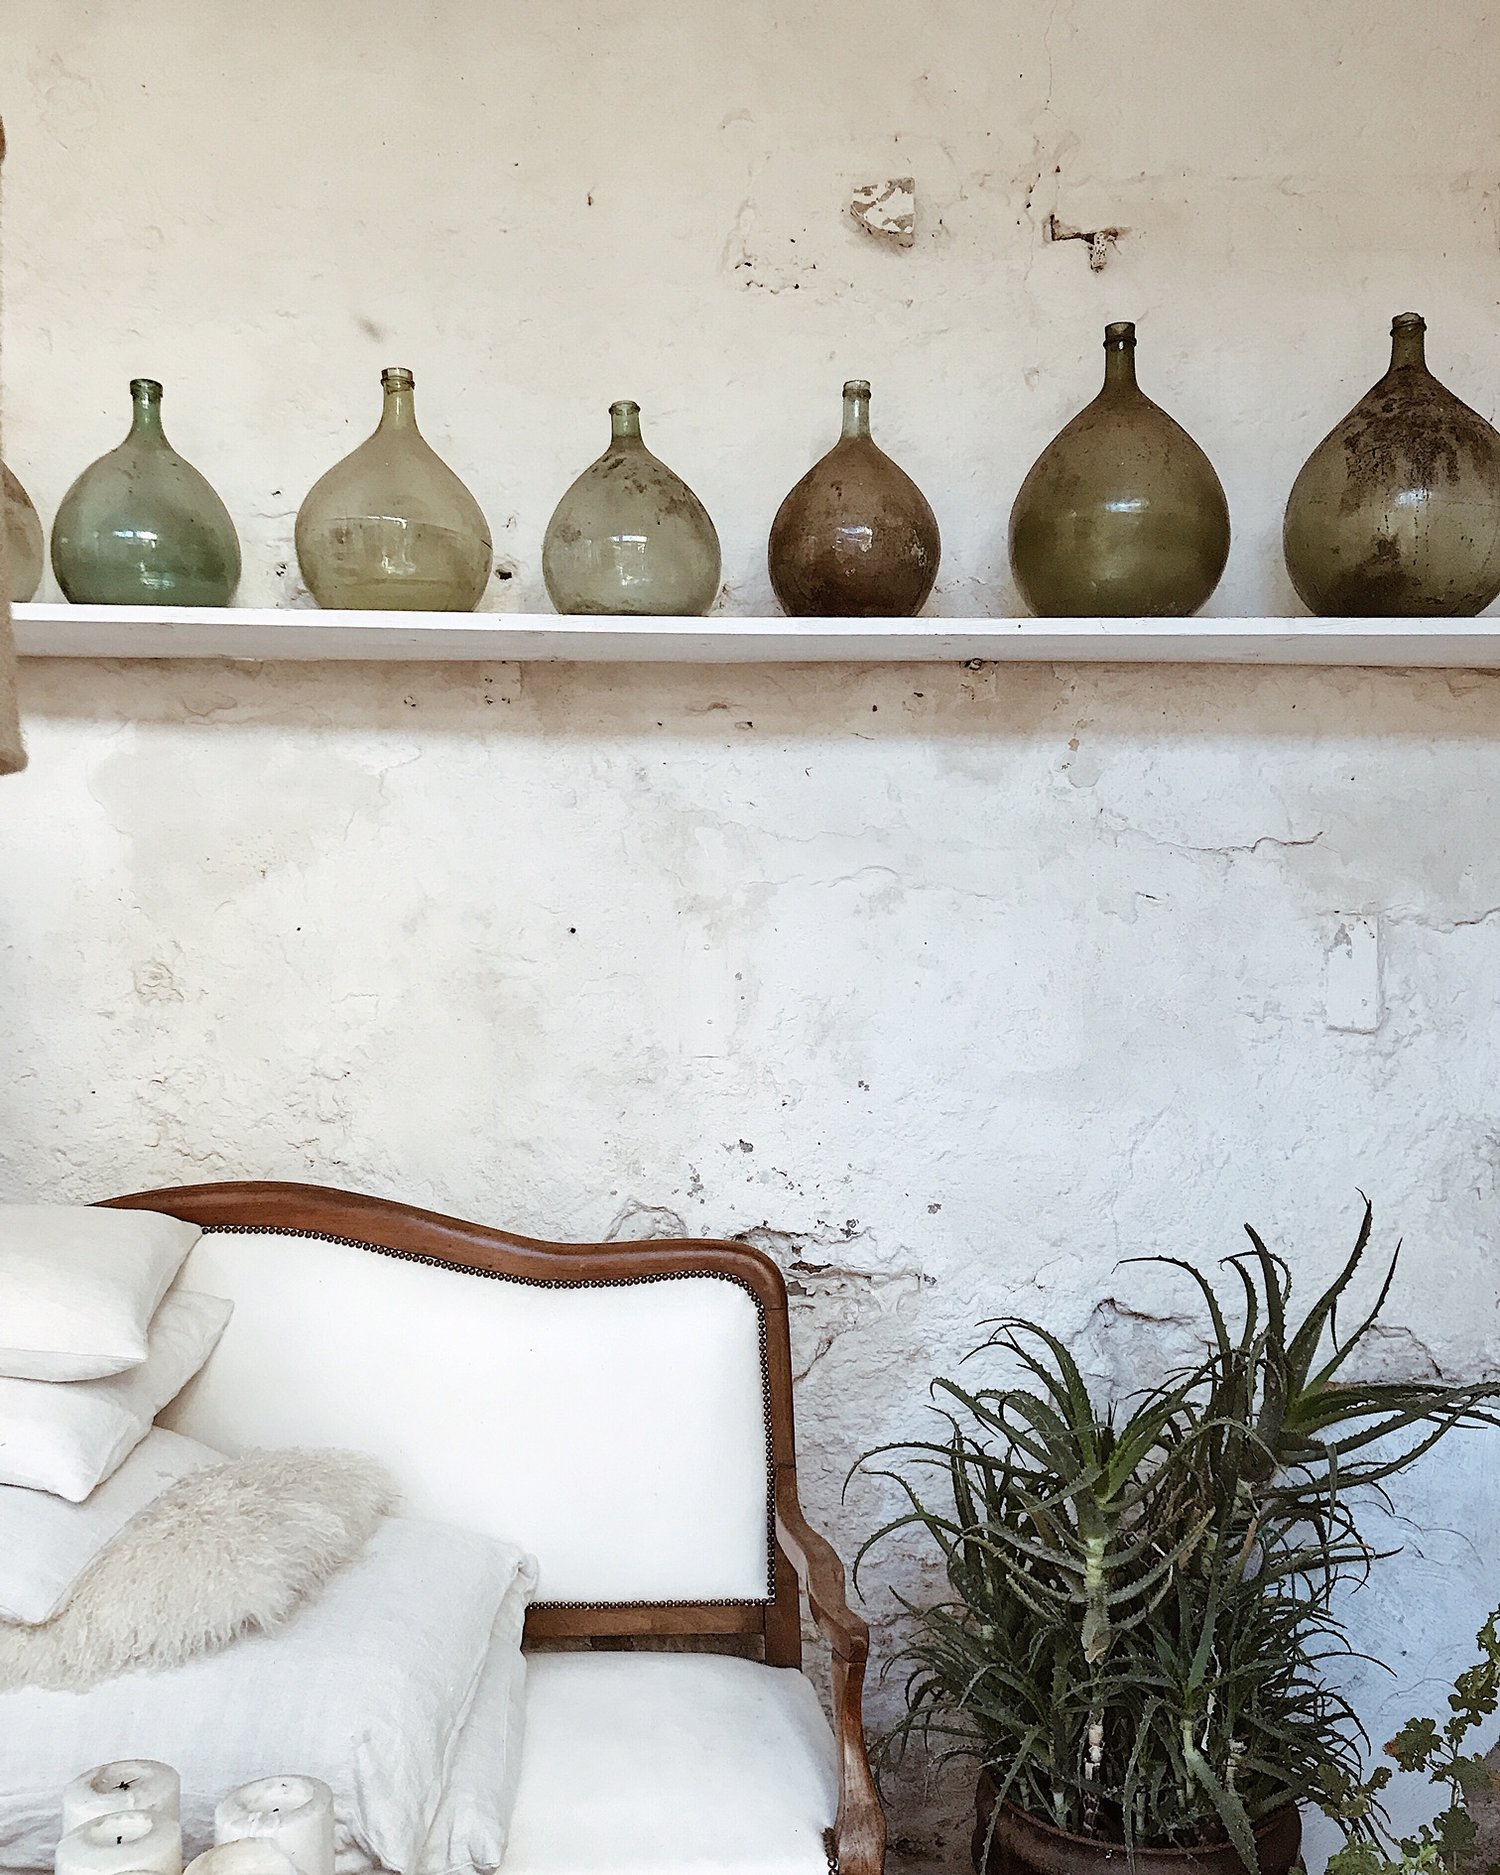 camellas-lloret-maison-d'hotes-greenhouse-couch-white-bottles.jpg